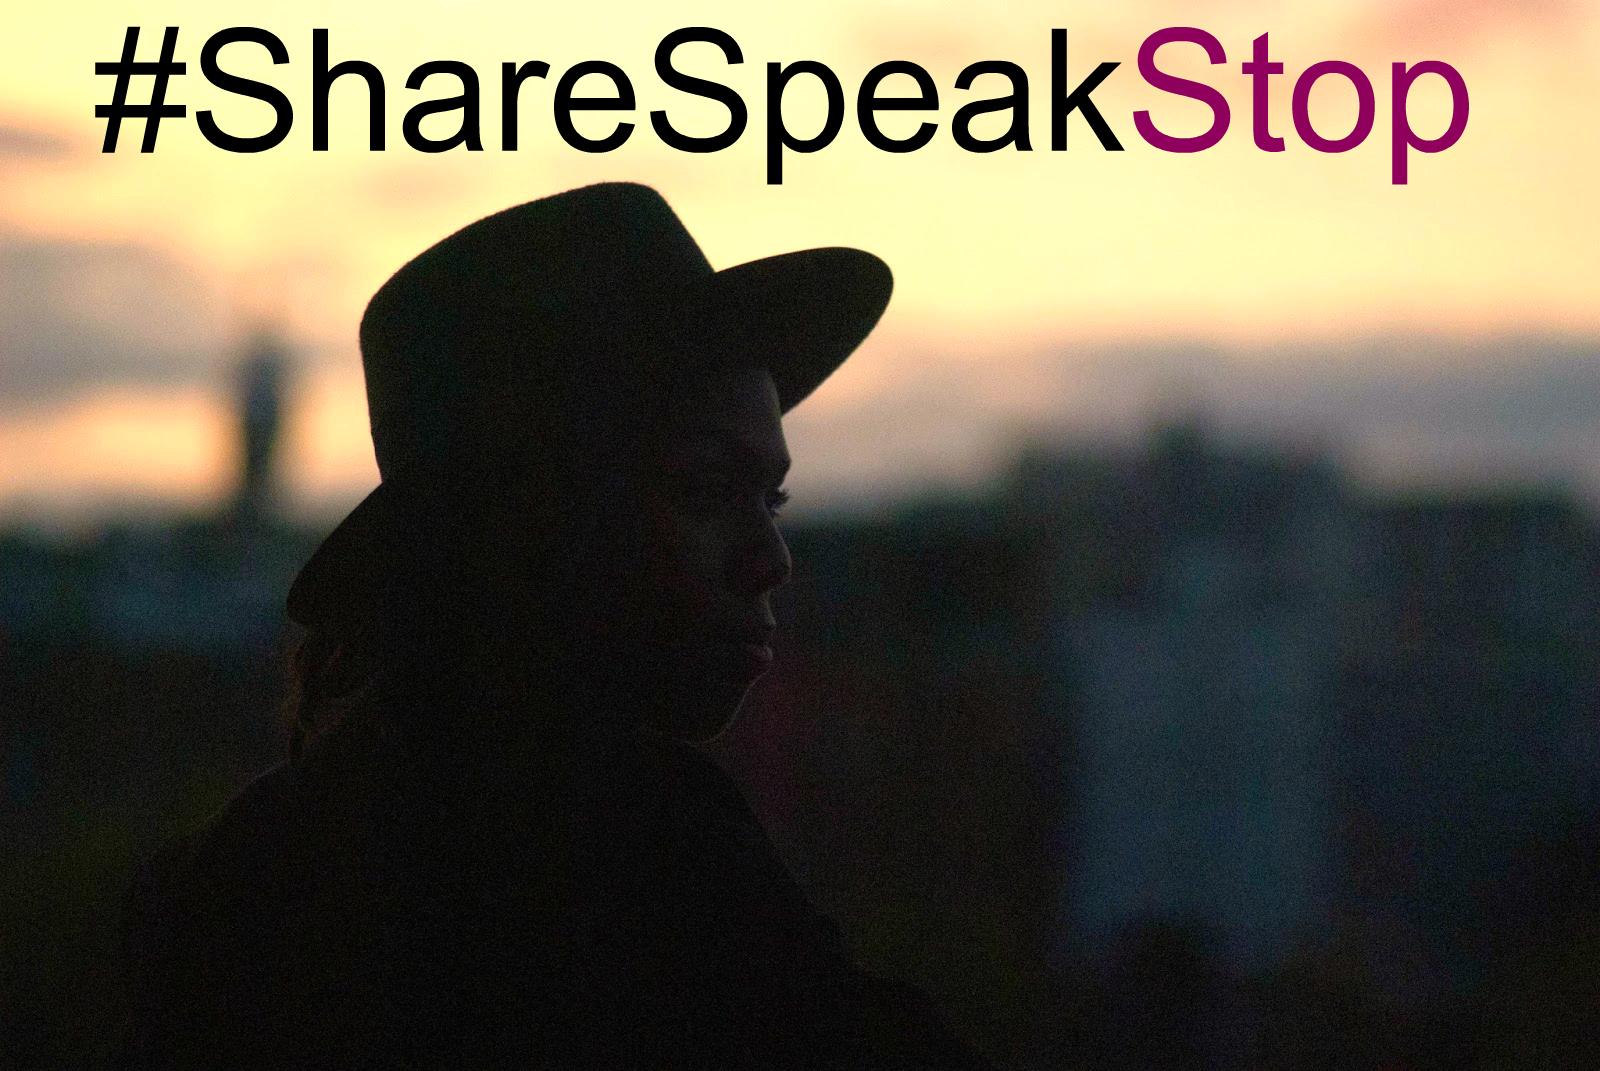 World Mental Health Day #ShareSpeakStop